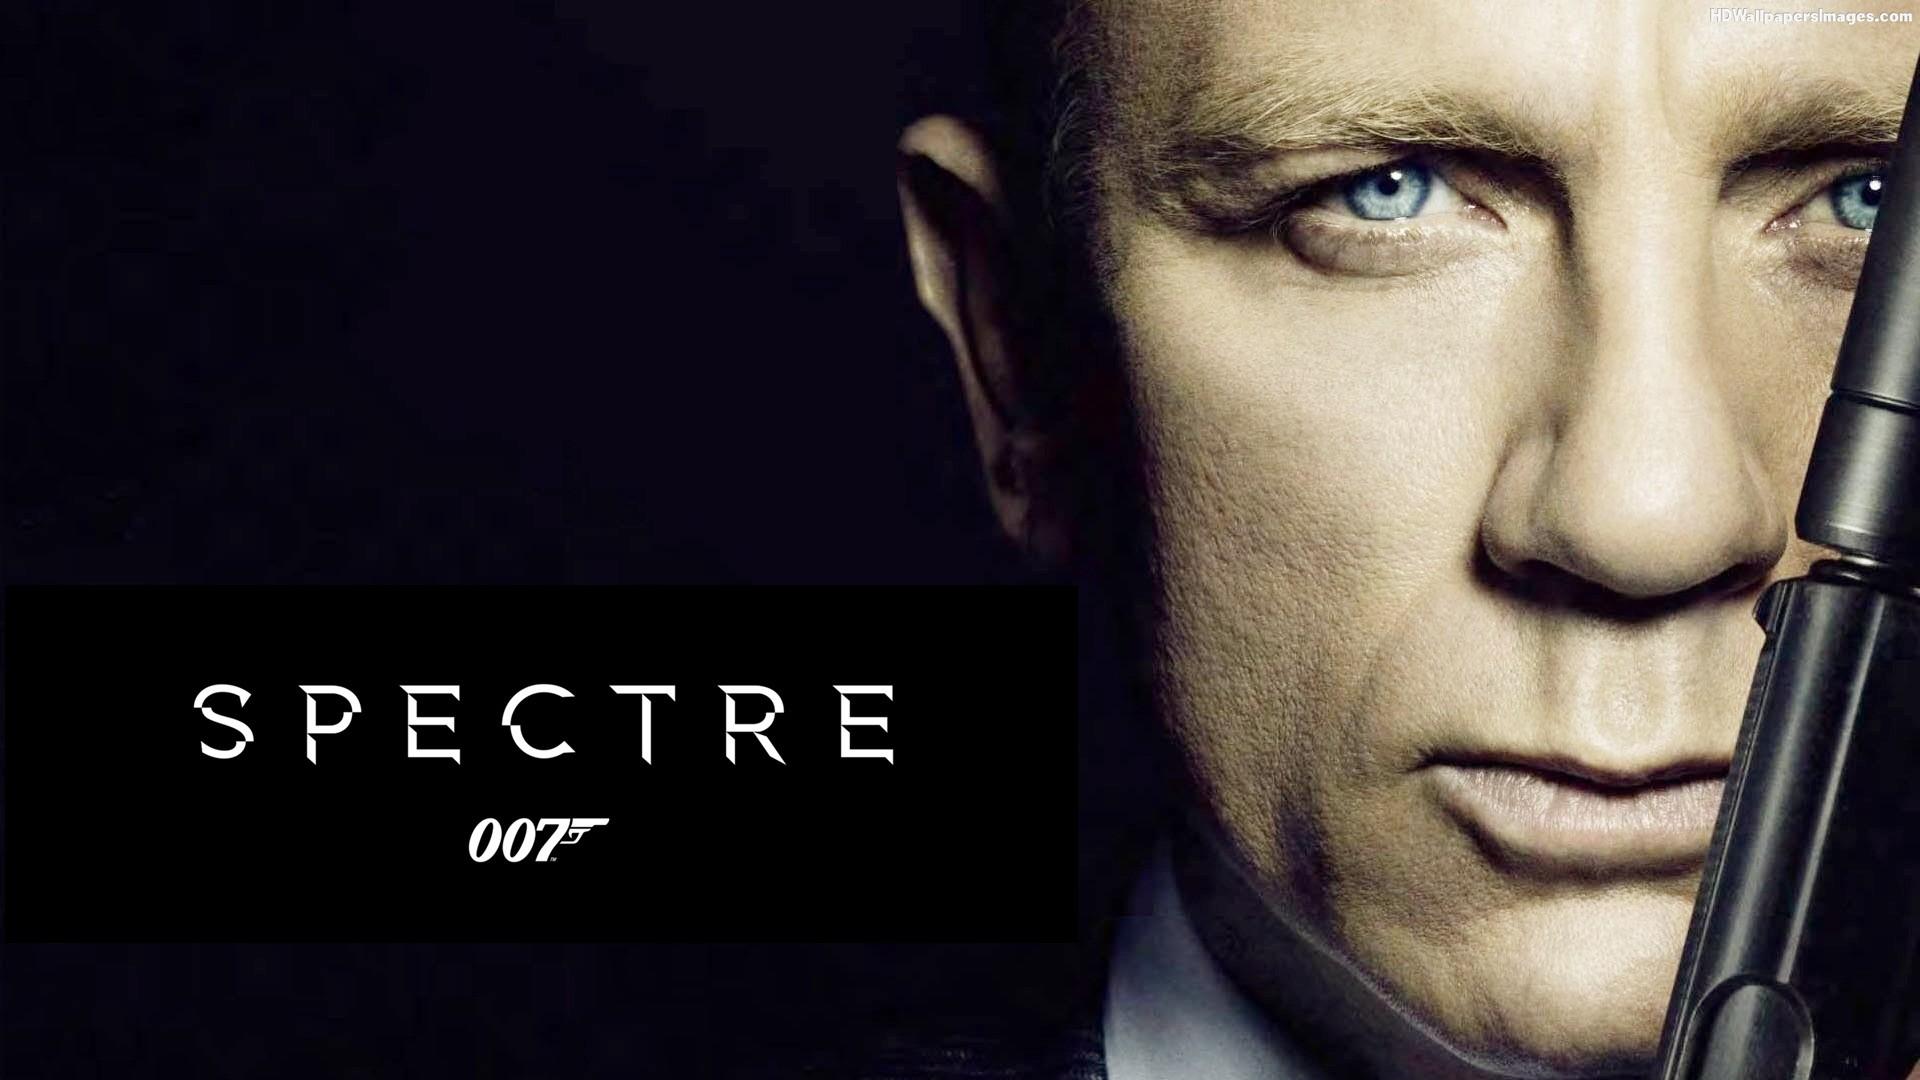 Cary Joji Fukunaga to Direct New James Bond Film